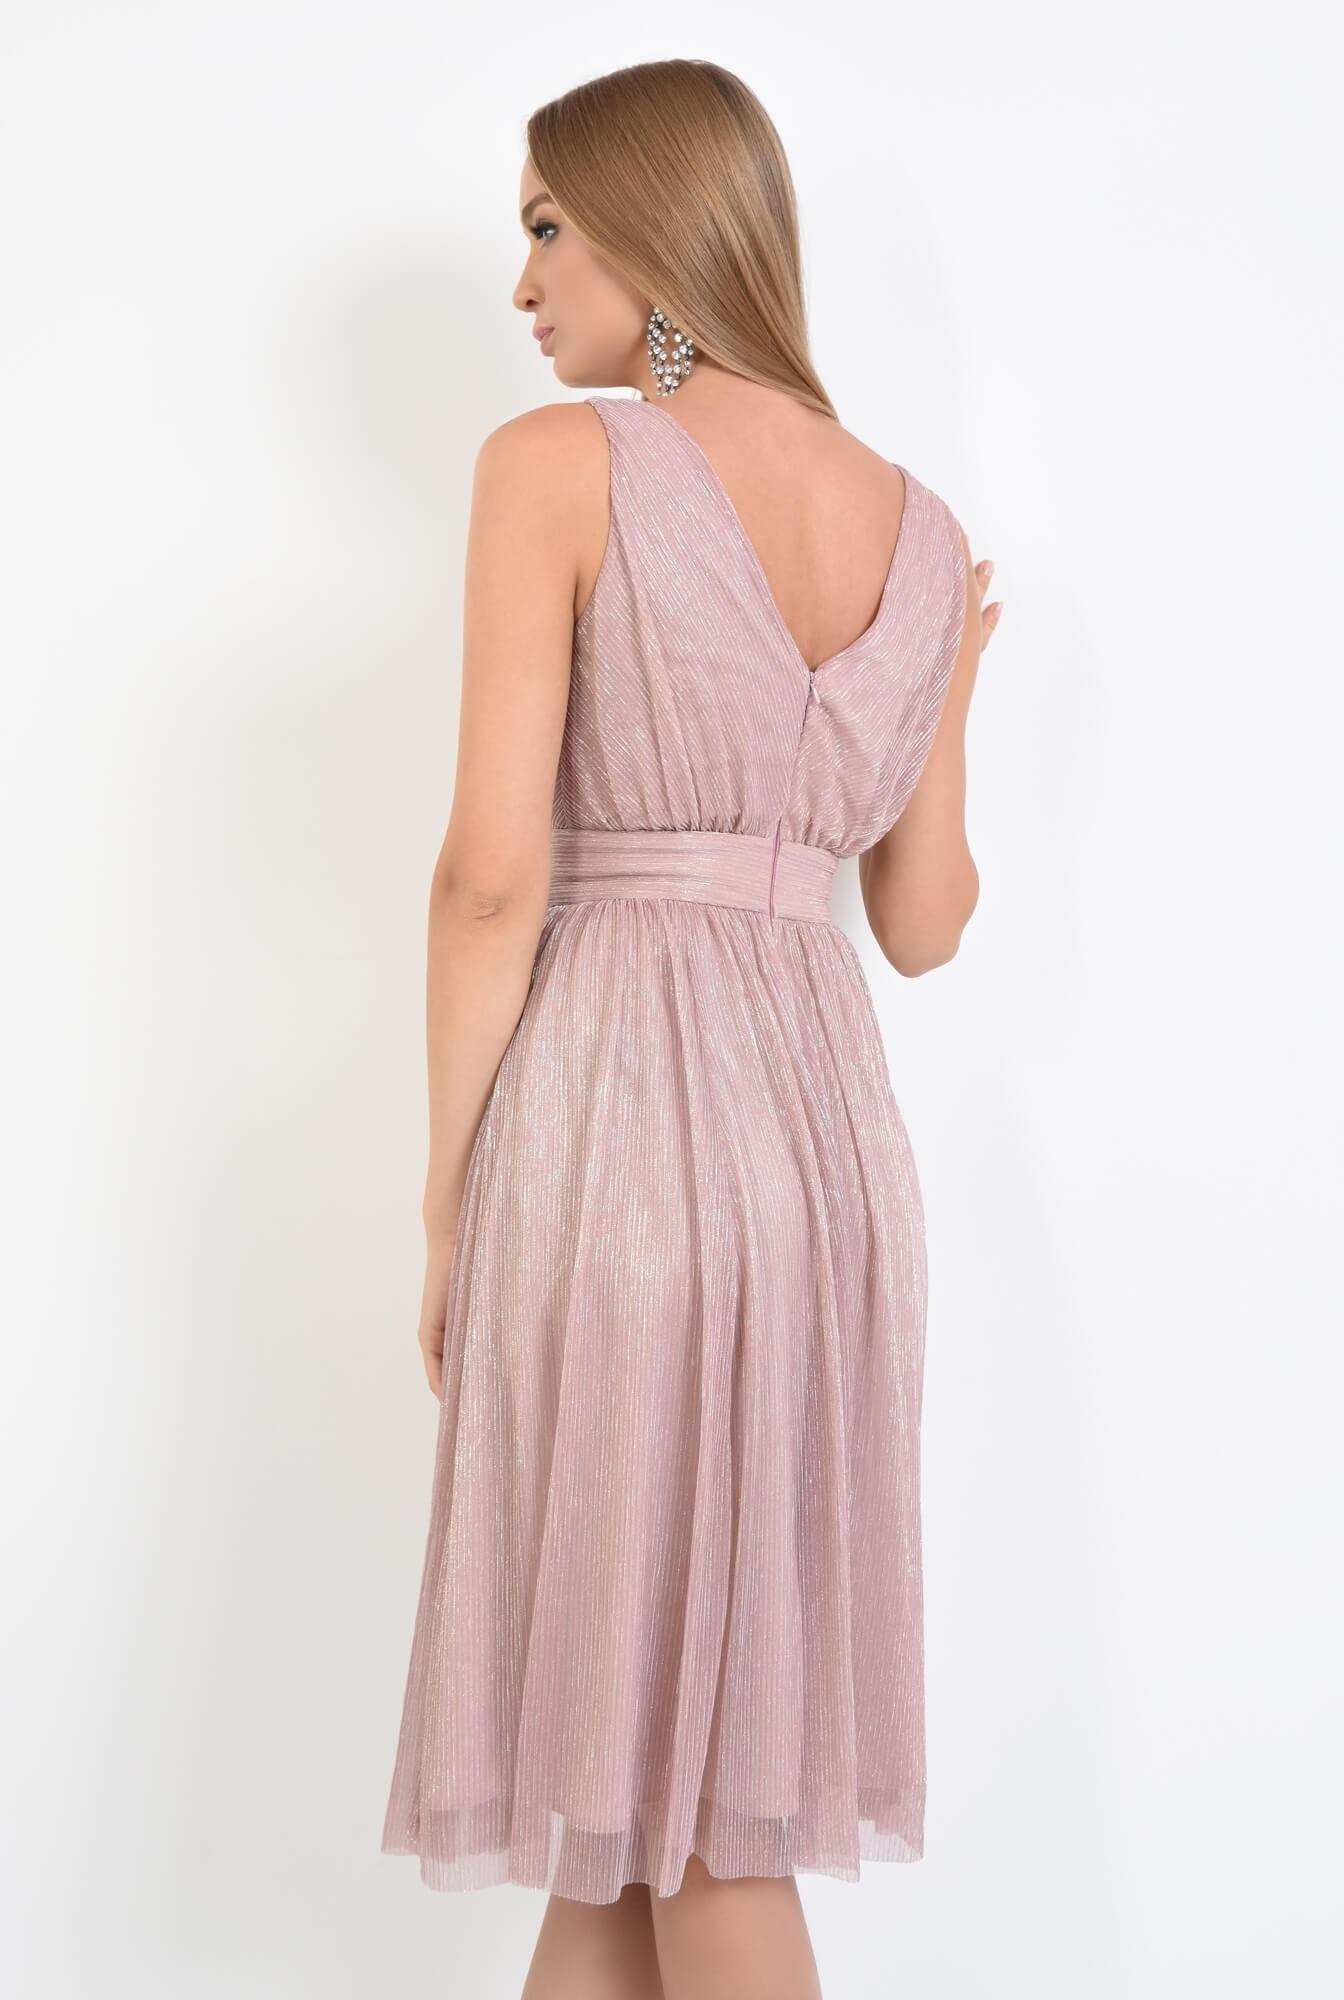 1 - rochie de seara, midi, clos, roz, lurex